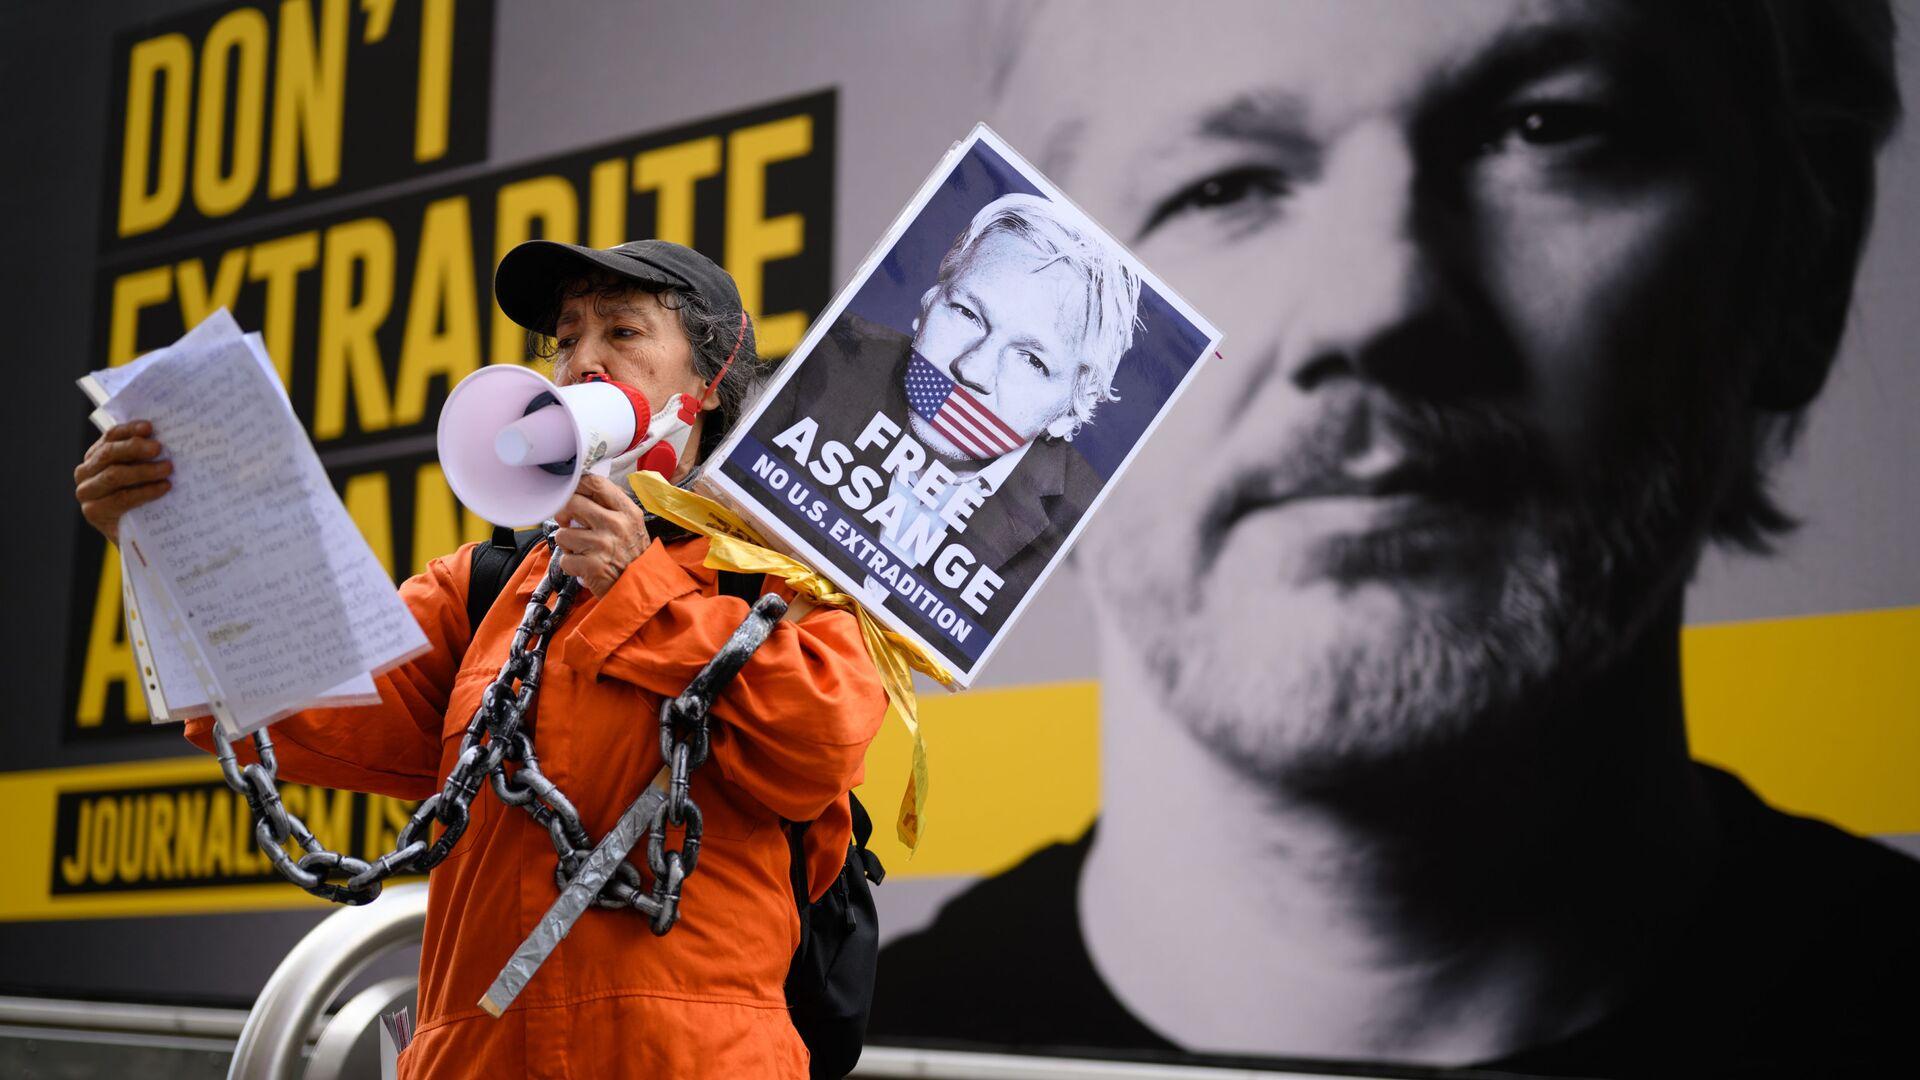 Сторонница Джулиана Ассанжа на митинге против экстрадиции Джулиана Ассанжа в Лондоне, Великобритания - Sputnik Italia, 1920, 27.07.2021